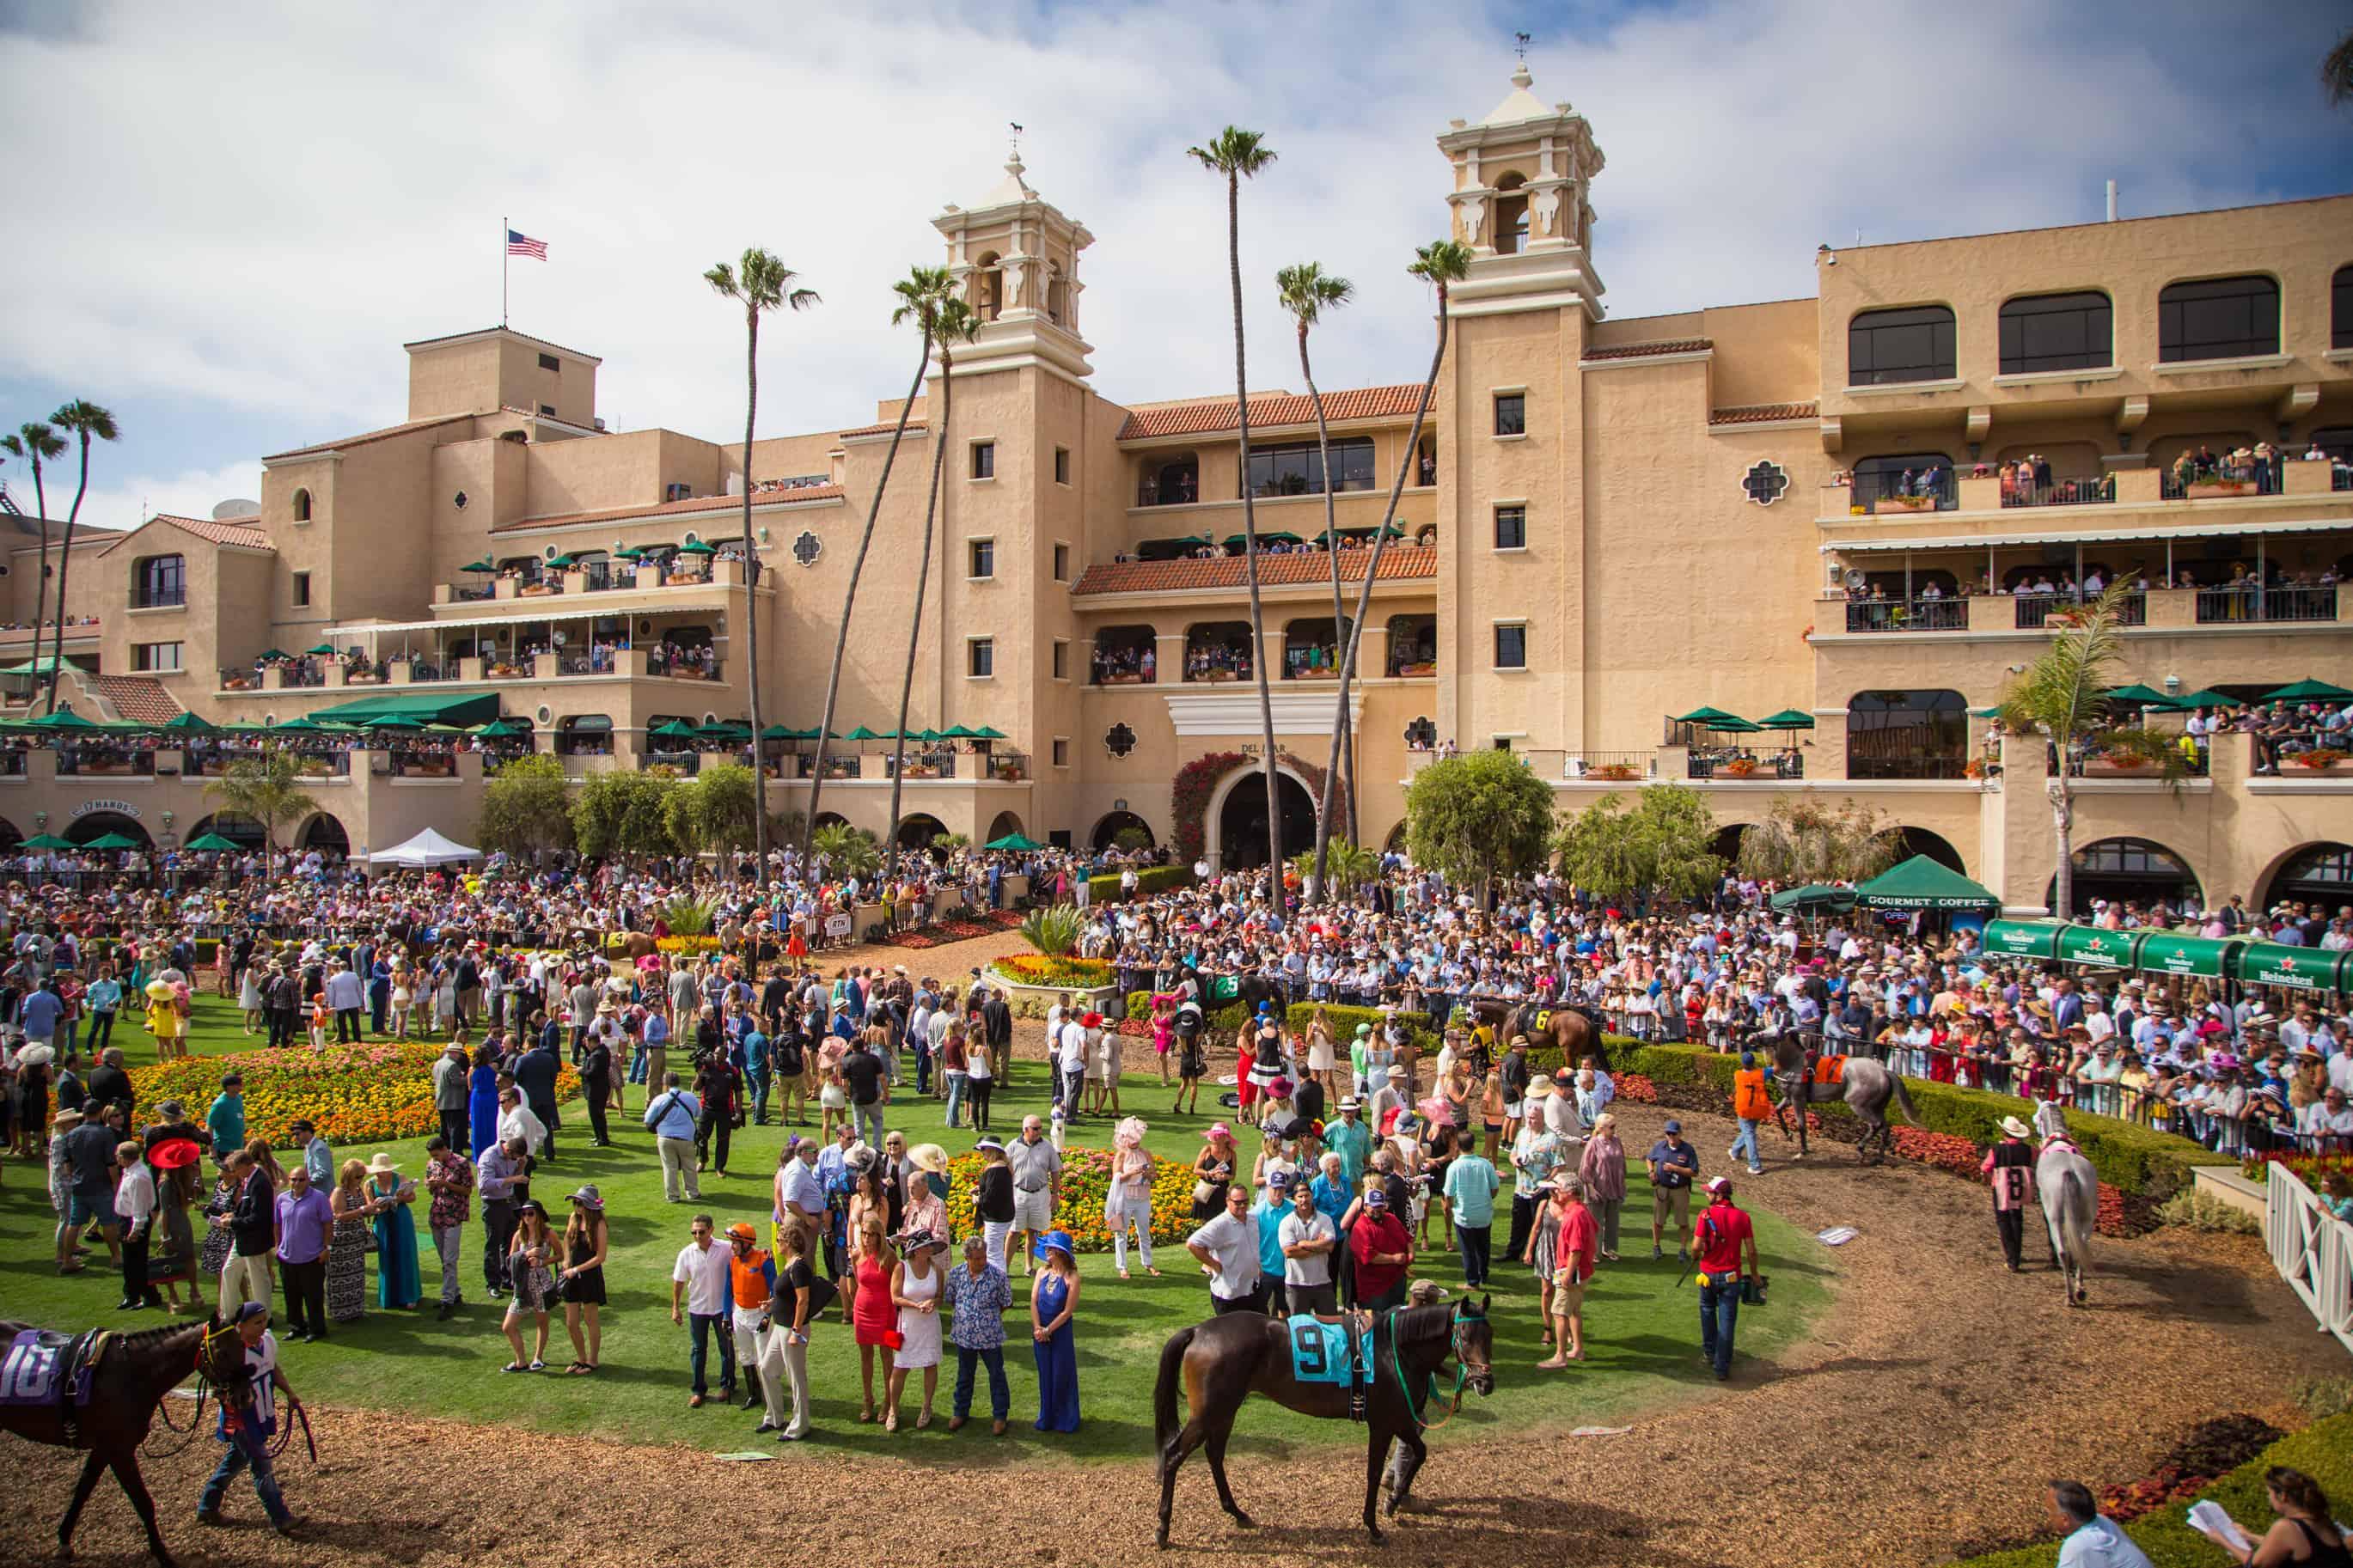 Del Mar Hard Money Lender - Horse Track